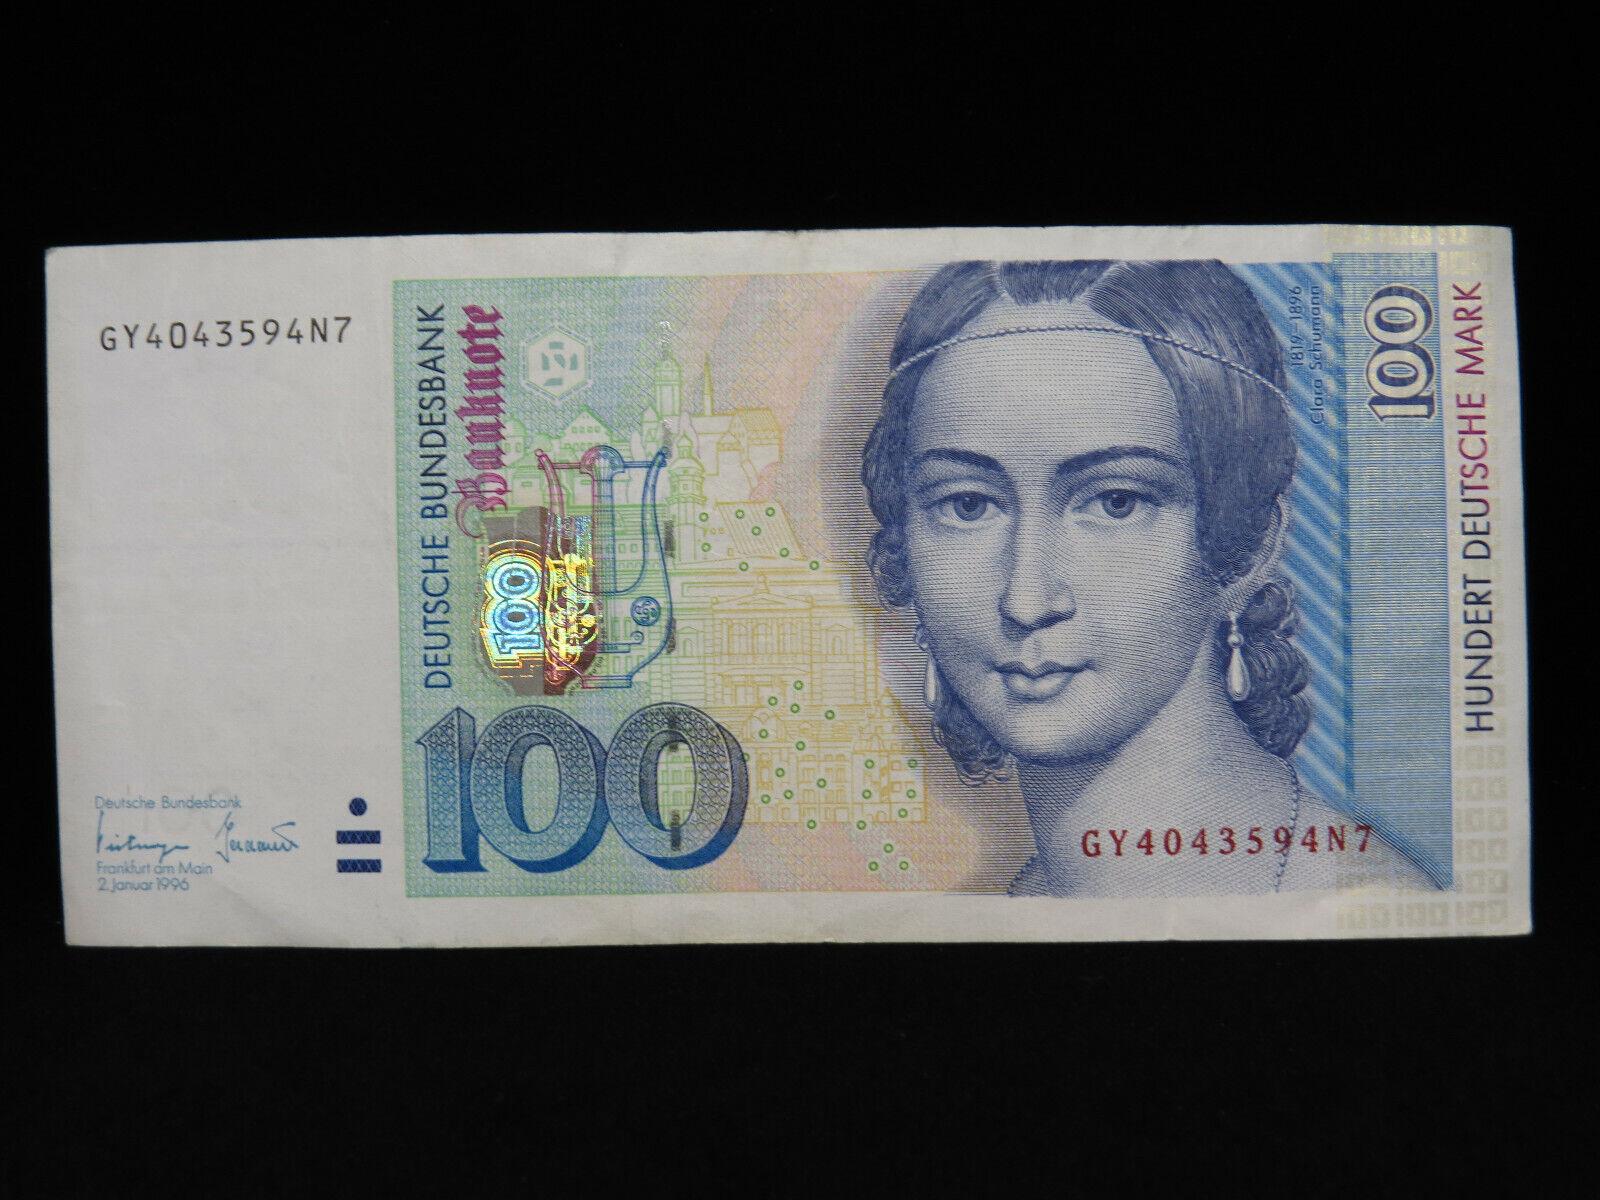 RECTO 100 Deutsche Mark Type 1996 - None